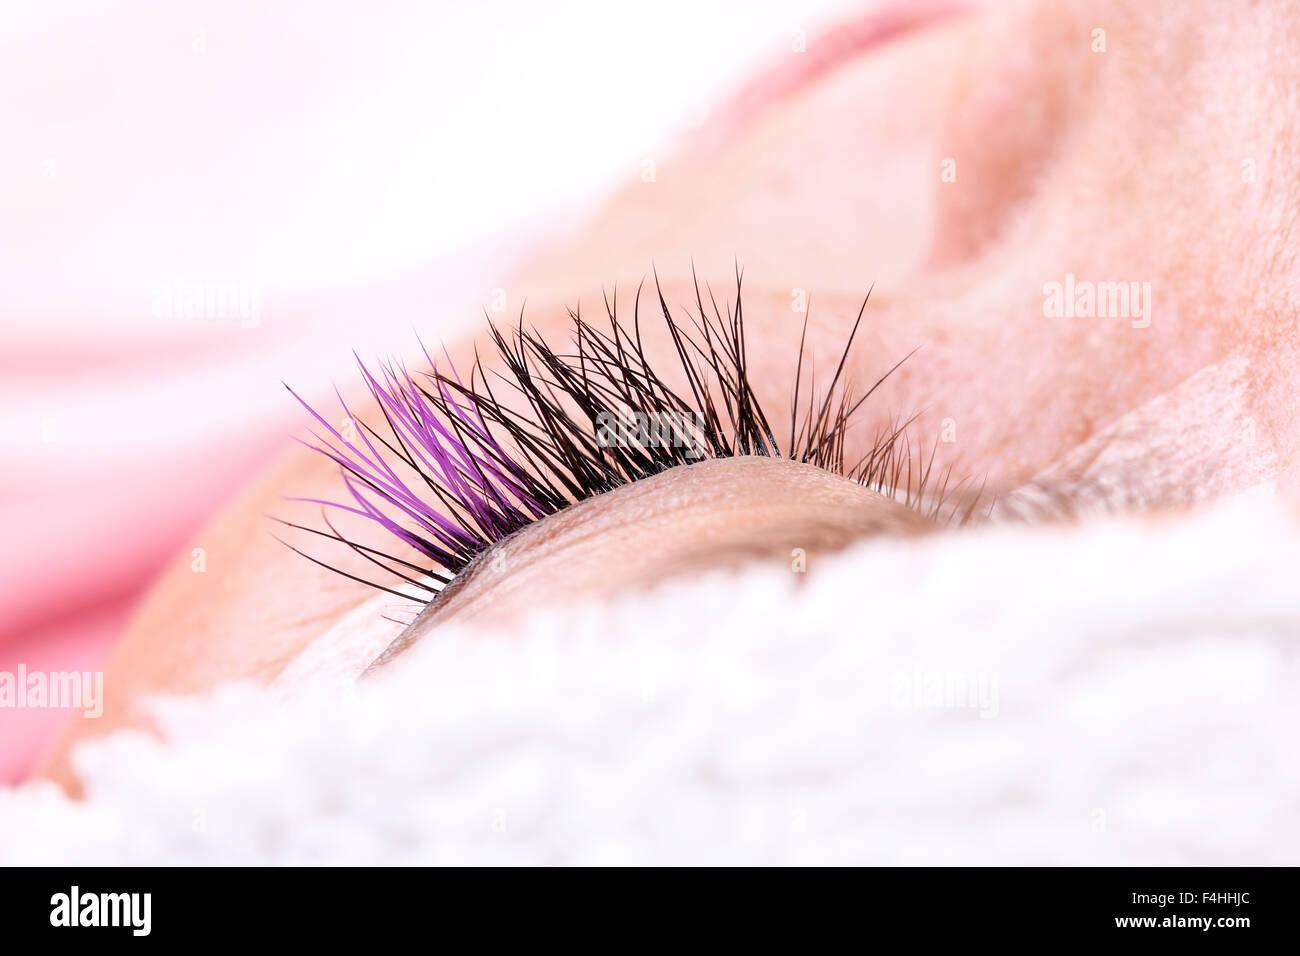 4554d17defd Lash making process, extreme long lashes with closed eye, woman eyelash  extension. Macro